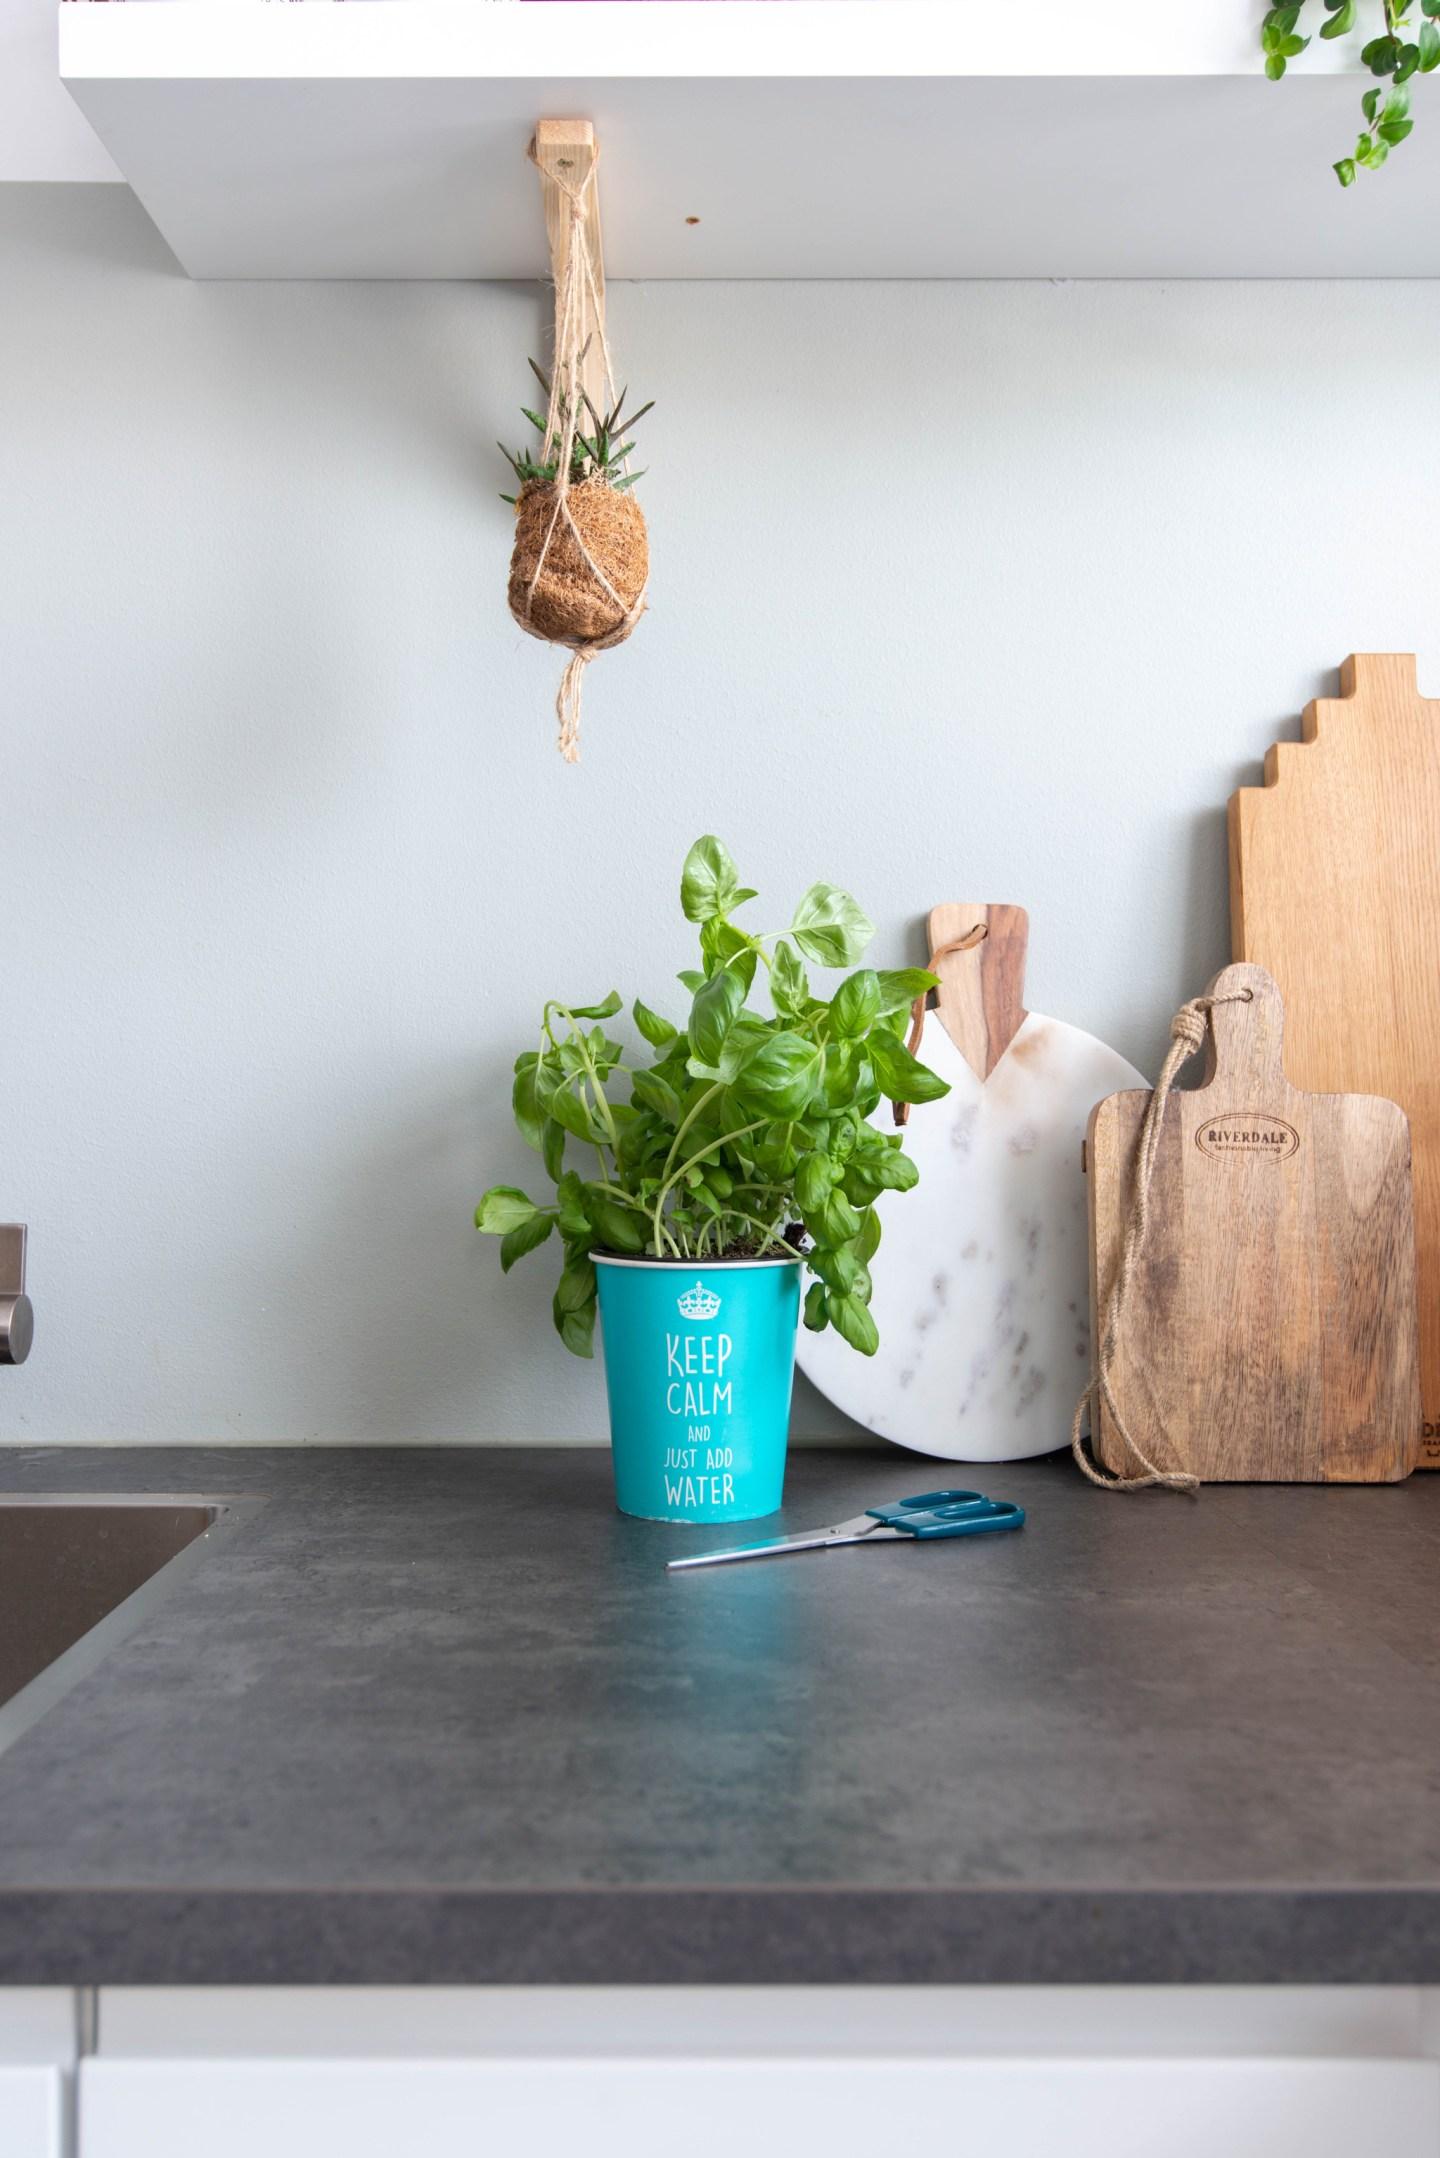 keeelly91 waterwick kruidenplant basilicum groene vingers keuken eetbaar systeem levende plant tips